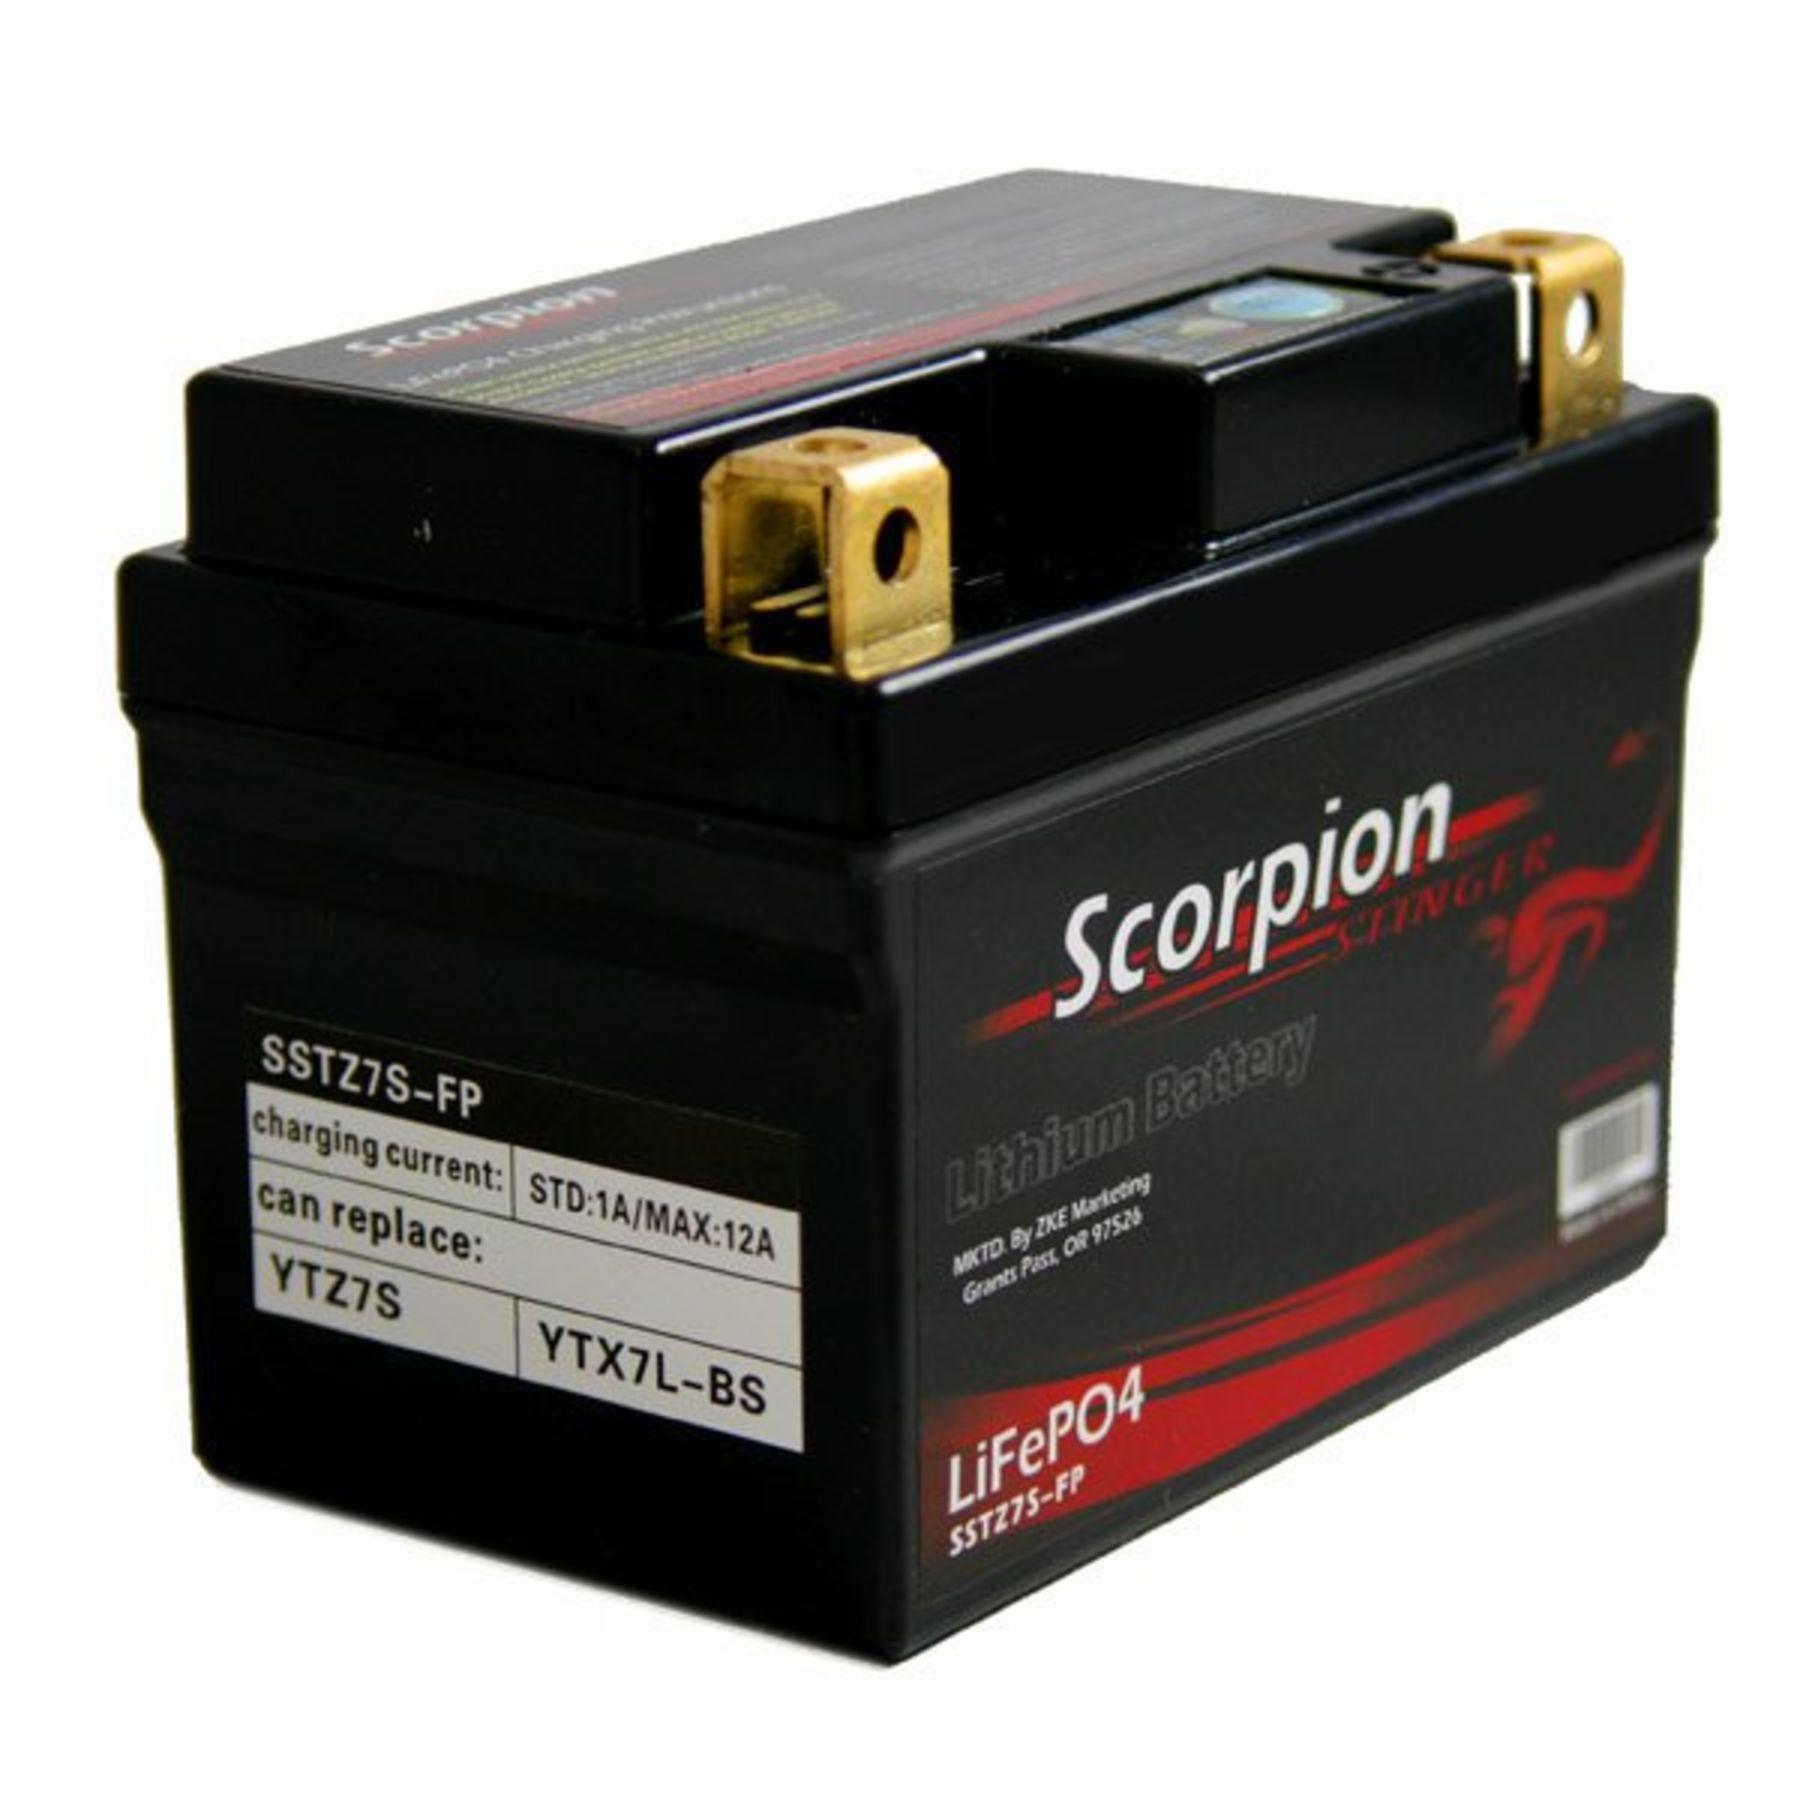 sstz7s-fp scorpion stinger 12v 219 cca lifepo4 extreme high output